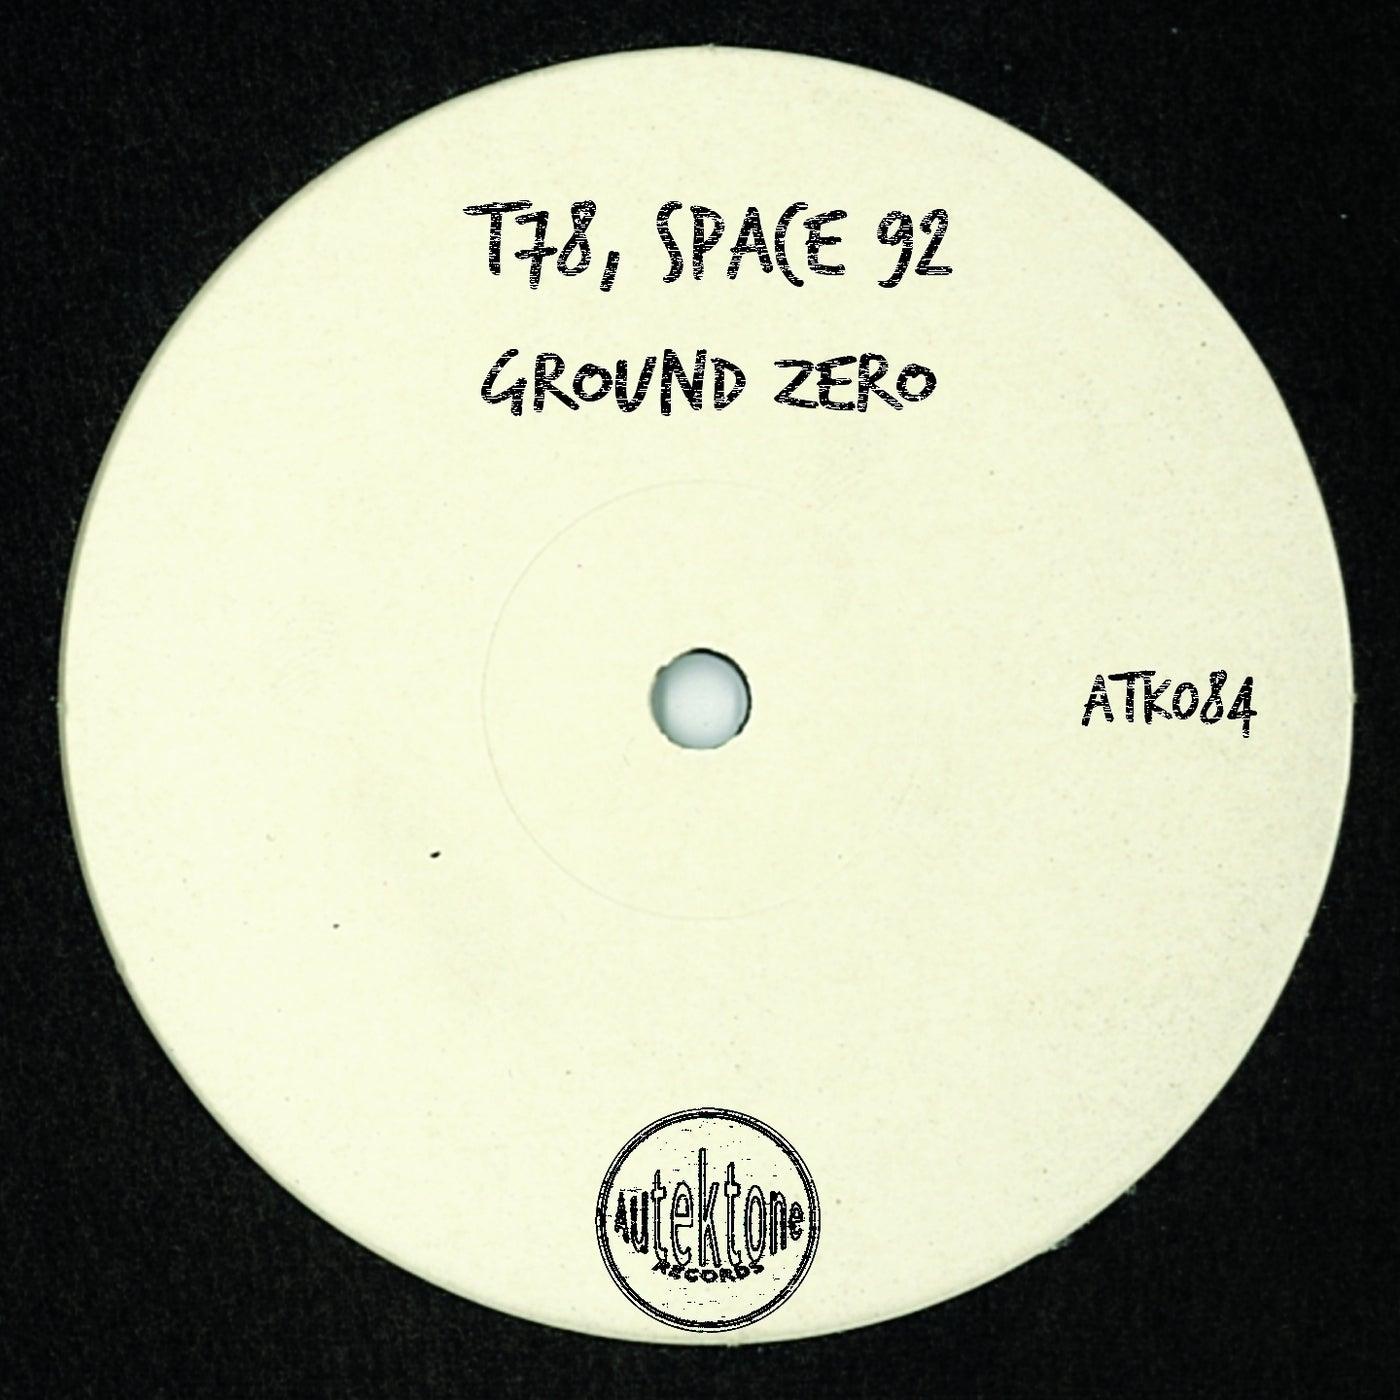 Ground Zero (Original Mix)